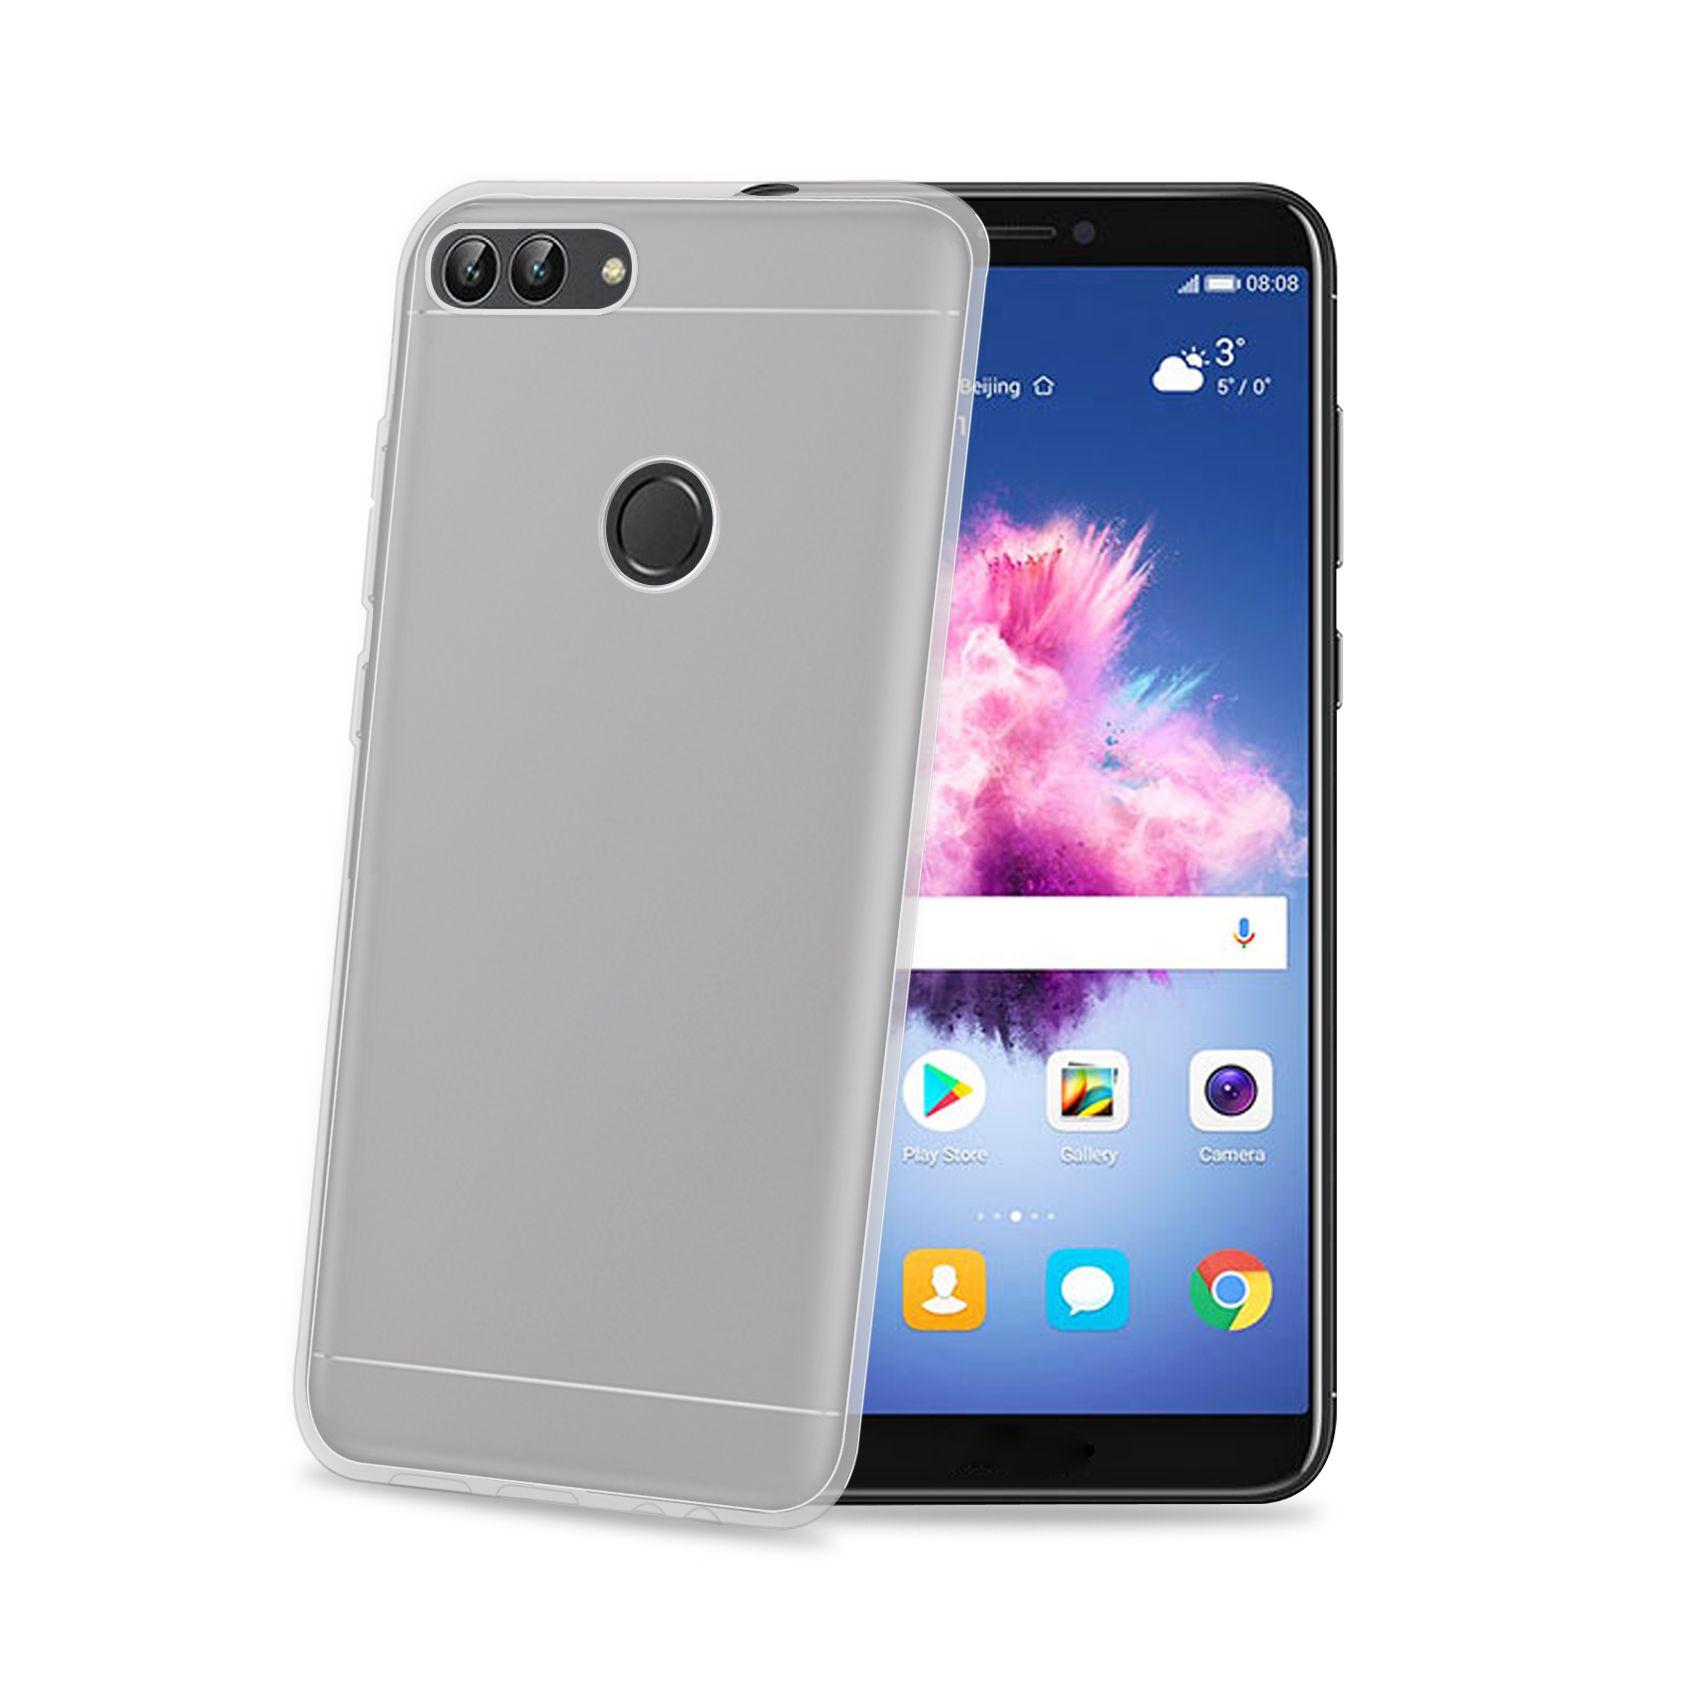 TPU pouzdro CELLY Huawei P Smart, bezbarvé